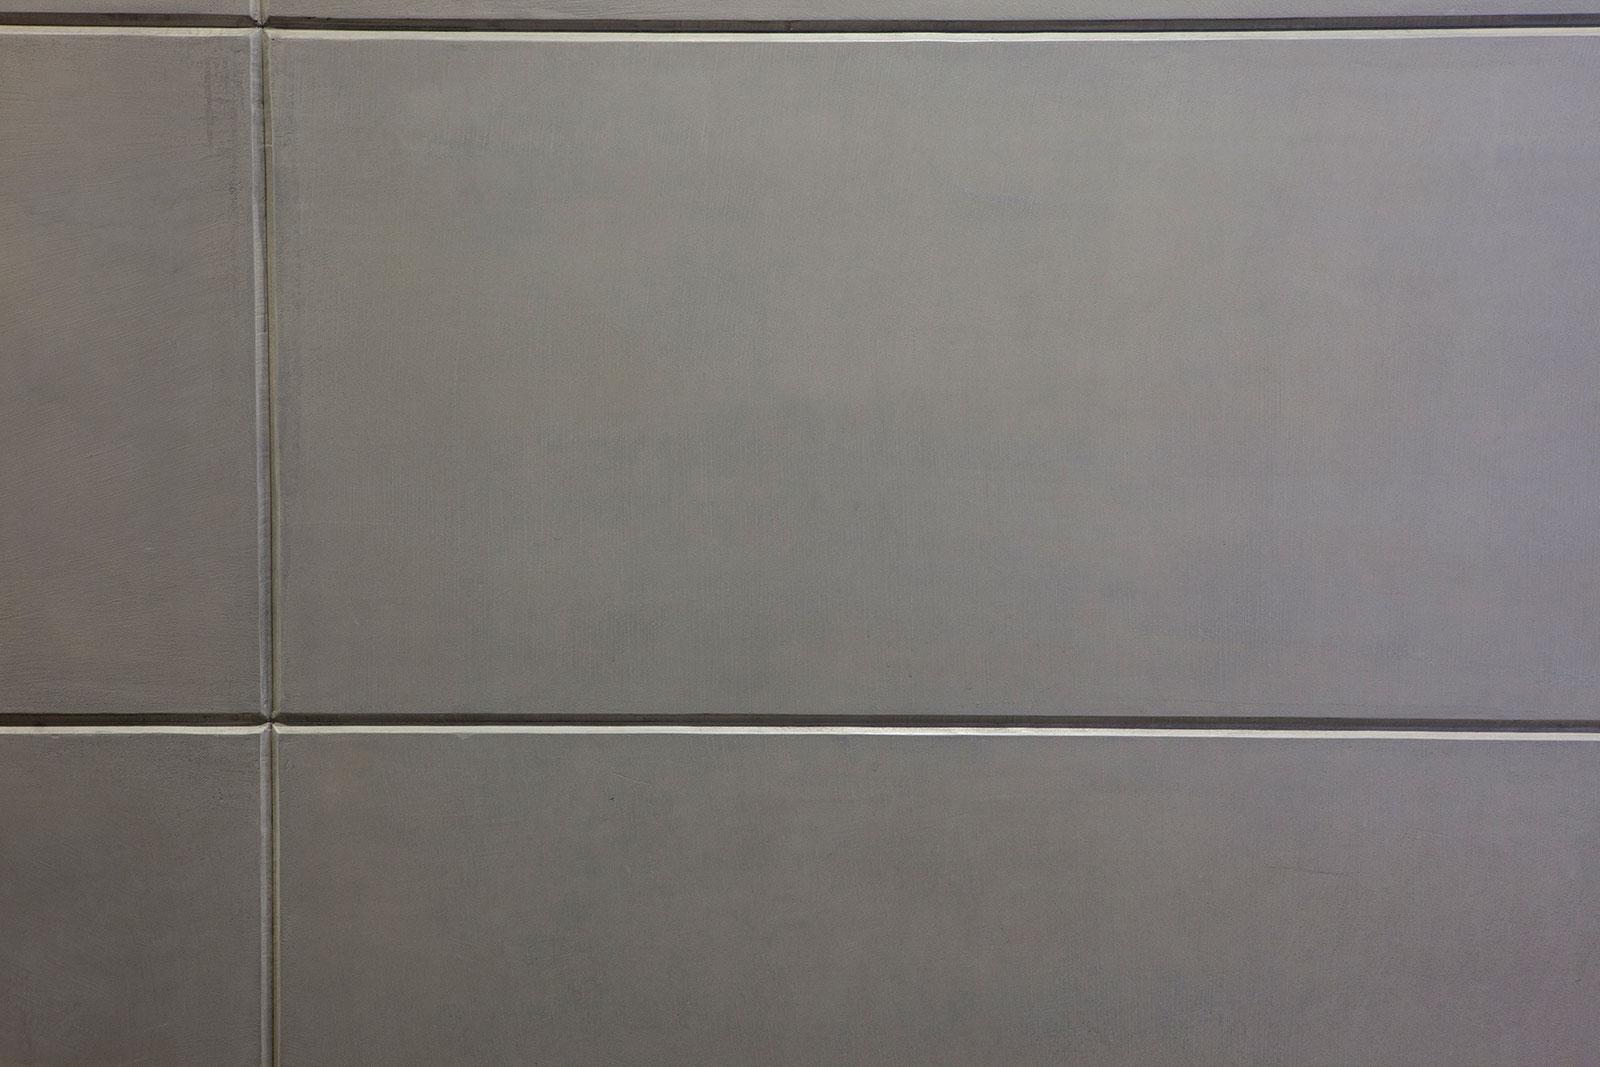 Concrete panel wall by BETONADA (6)